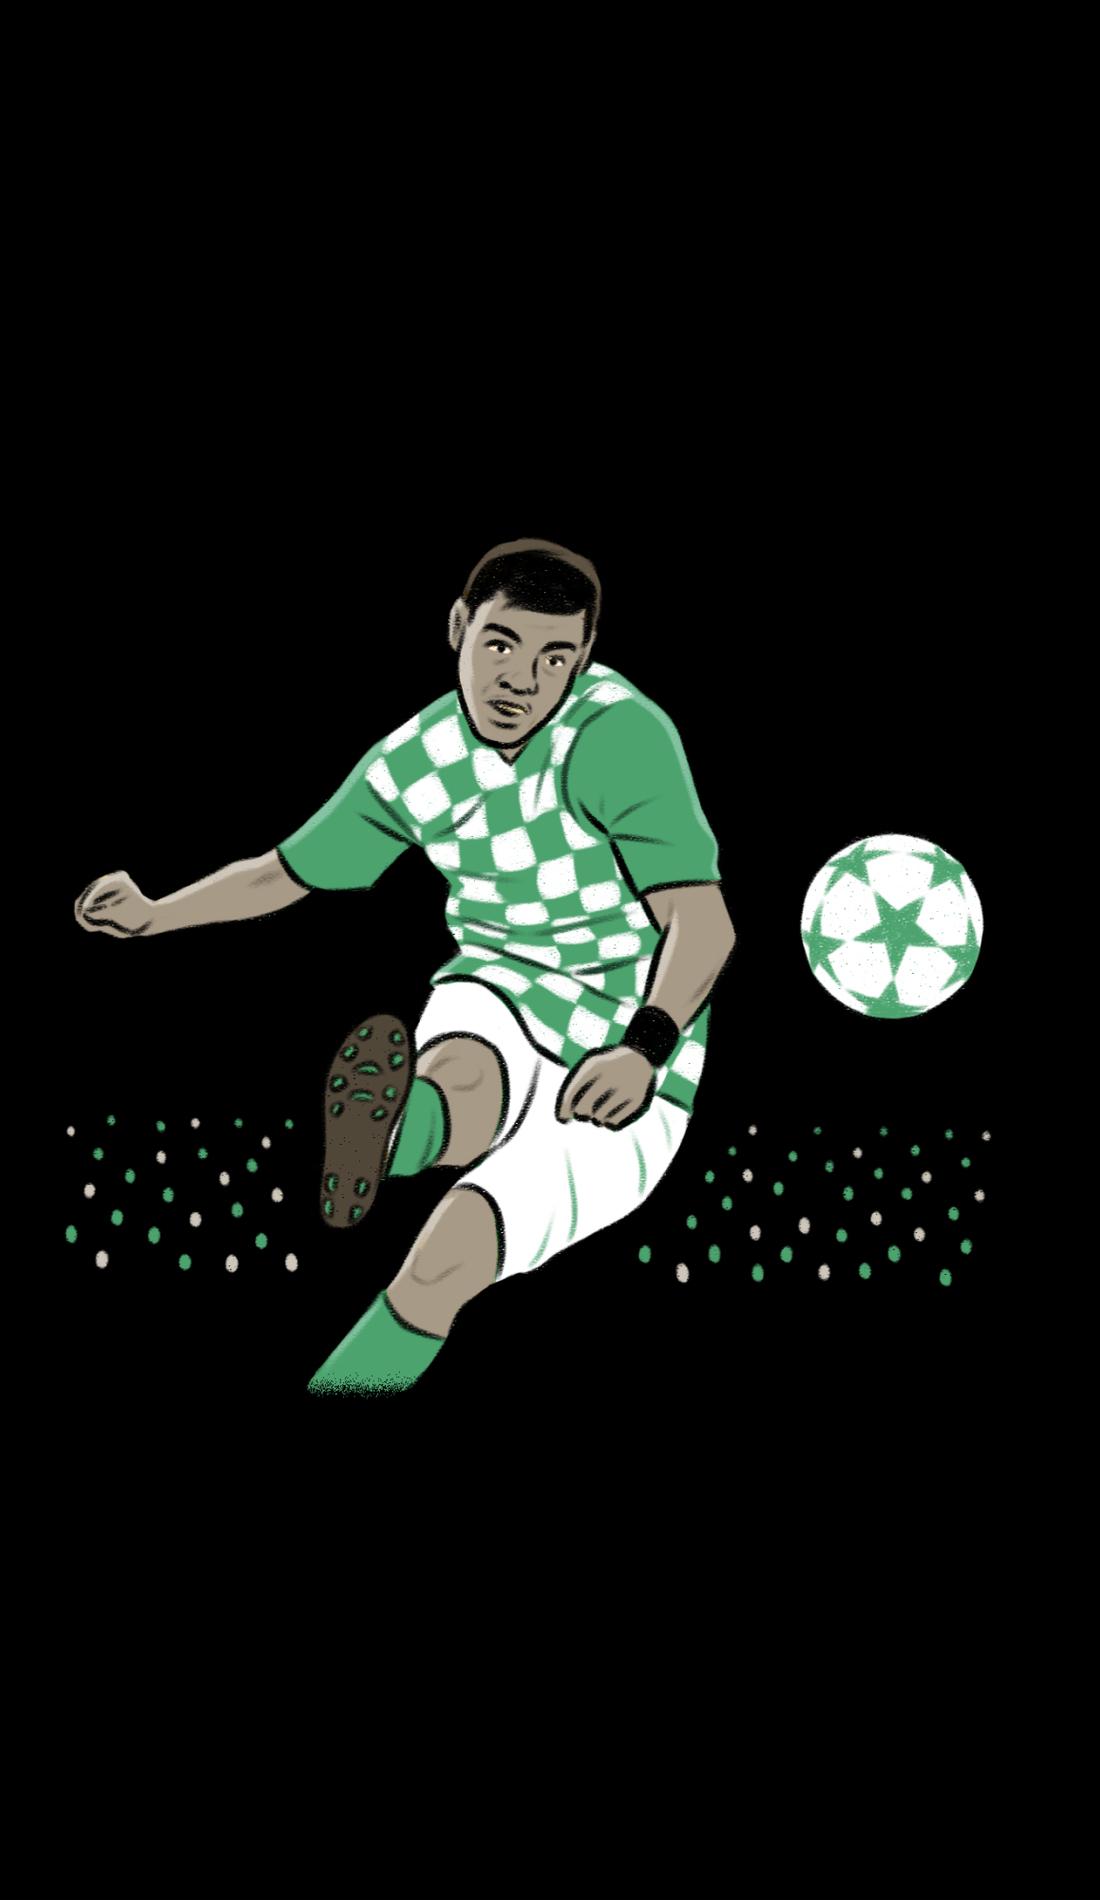 A Guatemala National Soccer Team live event